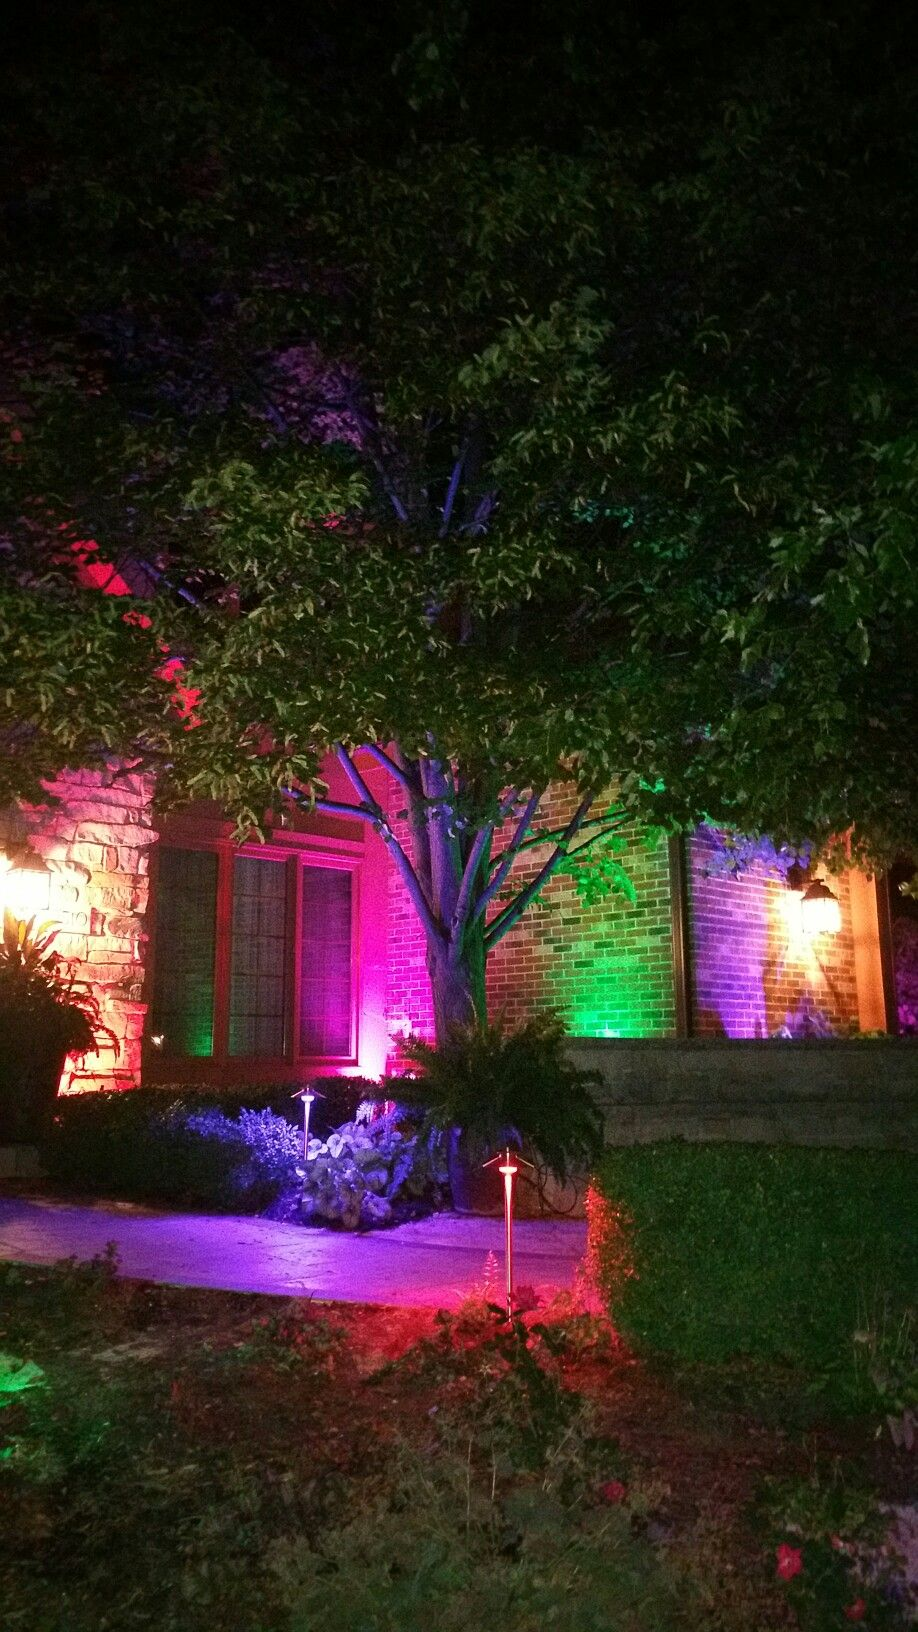 Outdoor Lighting Zdc Luxor Color Changing System Outdoorlighting Landscapelighting Led Lightingconcepts Pathlights Spotlights Pohon Lampu